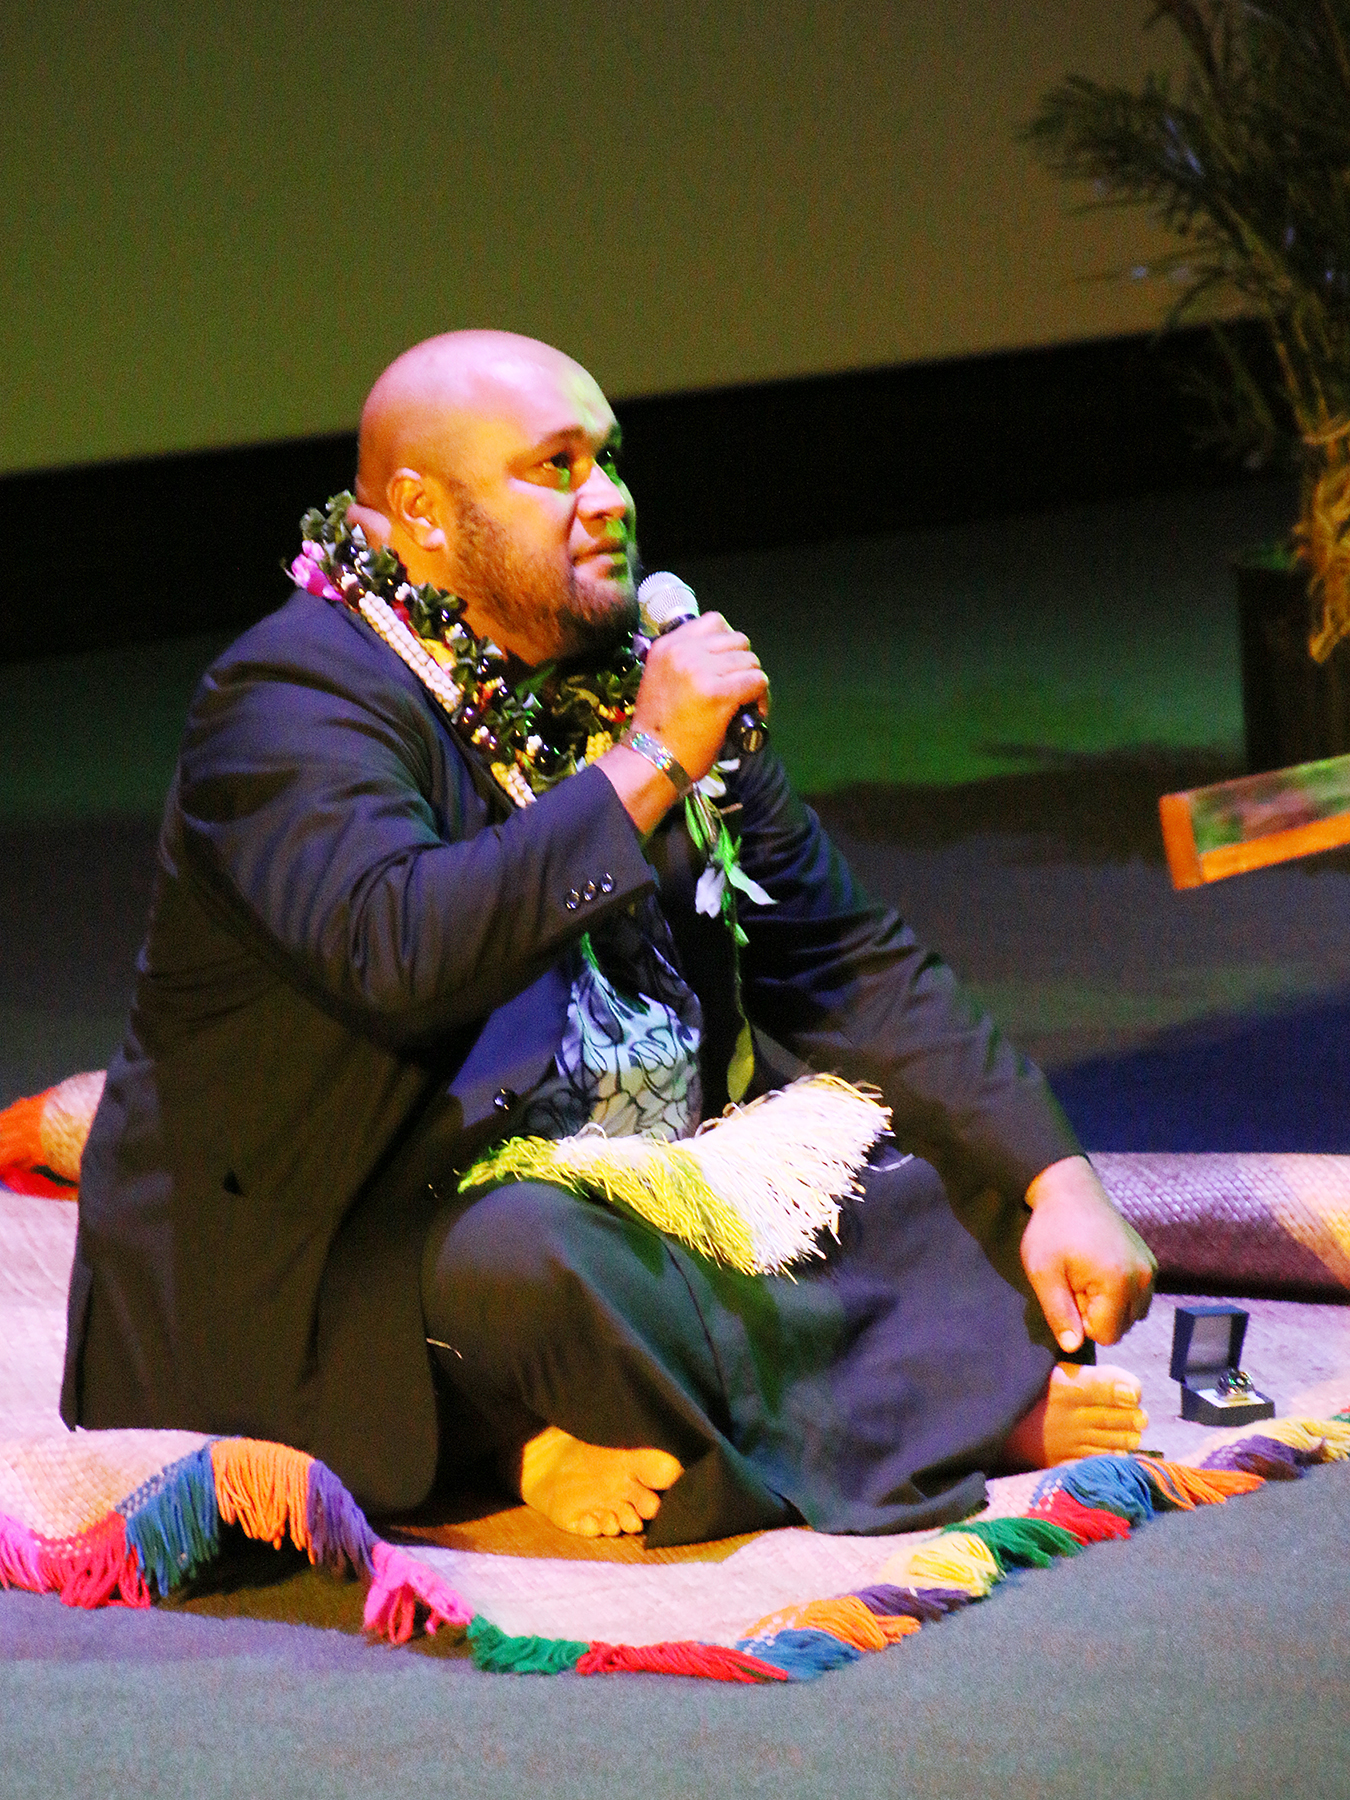 Ma'ake Kemoe'atu at the Polynesian Cultural Center